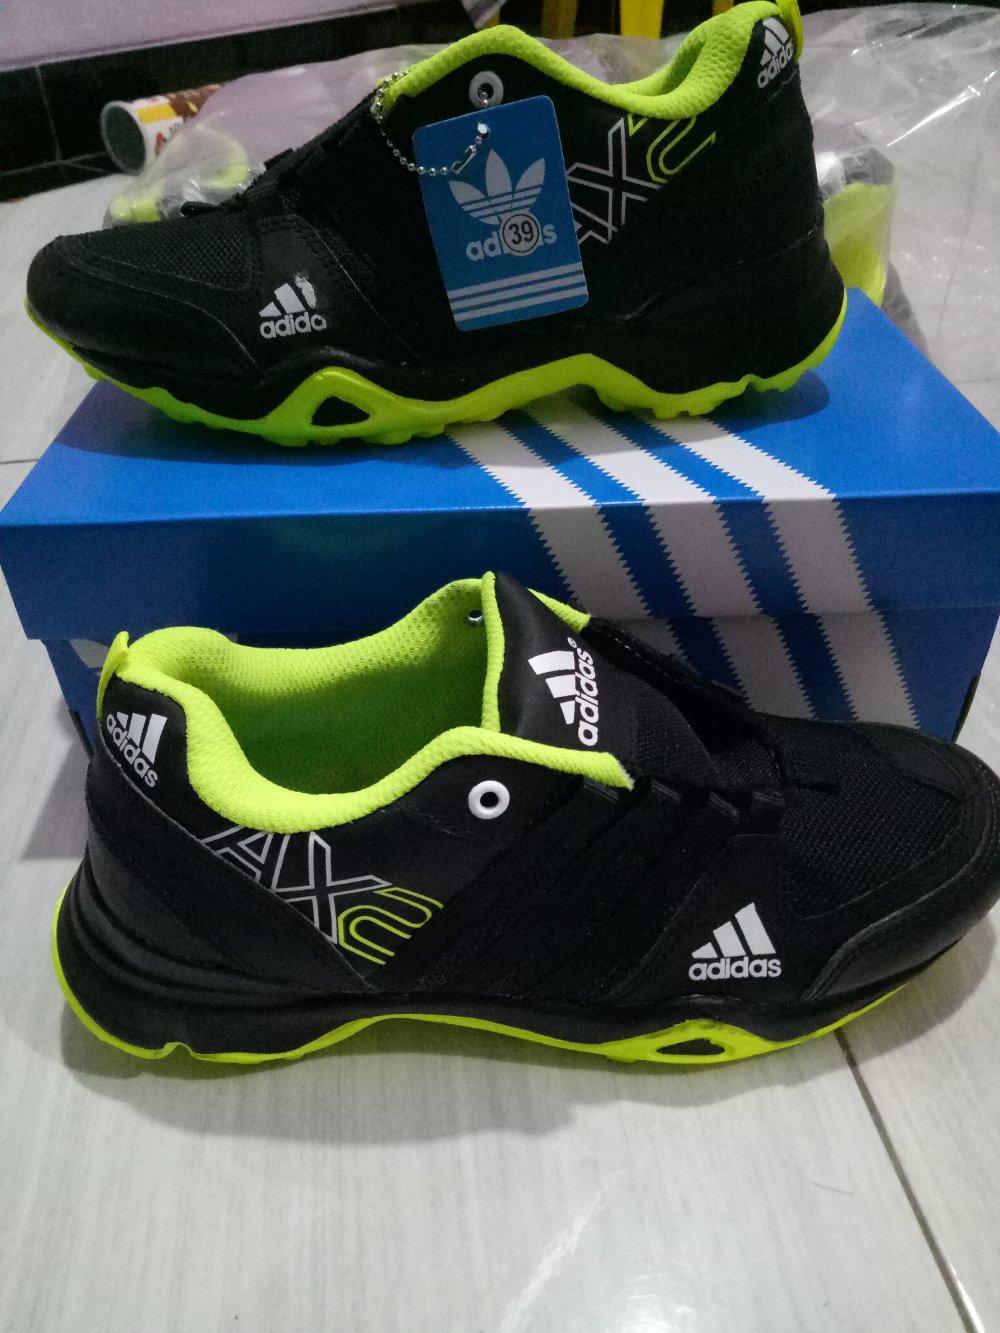 Kelebihan Sepatu Reebok Pria Sneaker Joging Lari Olahraga Sport ... d2fdfb95f0